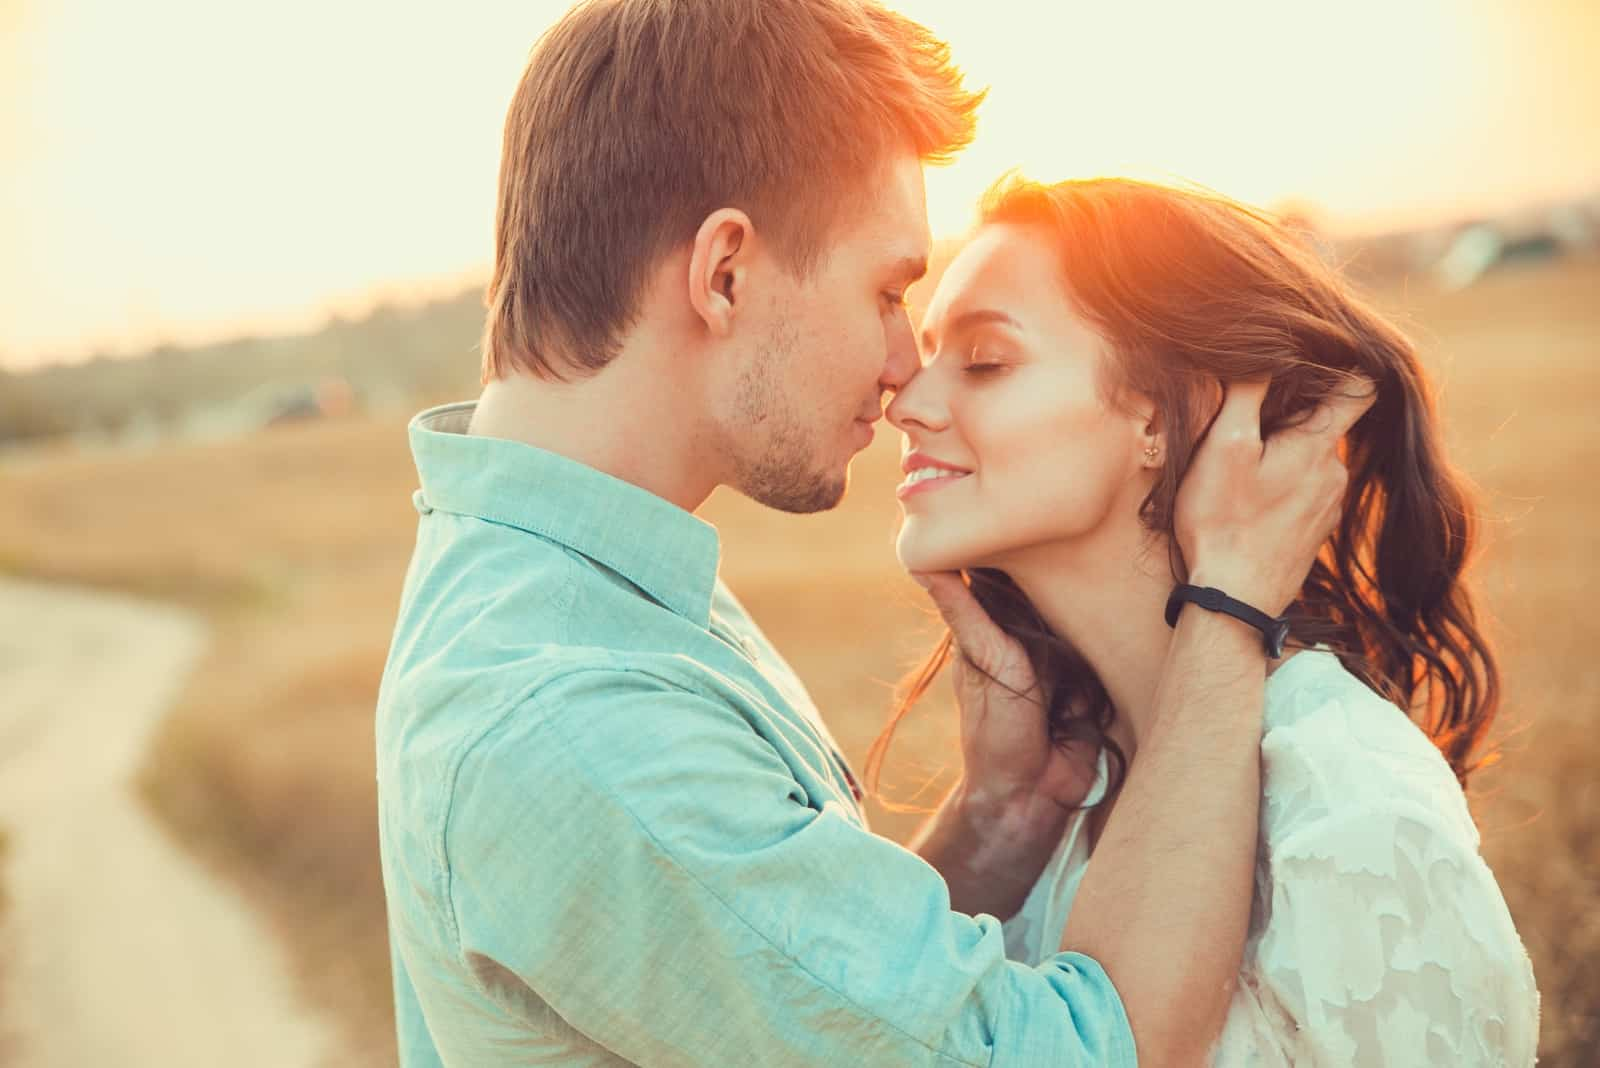 man touching woman's hair while standing near grass field